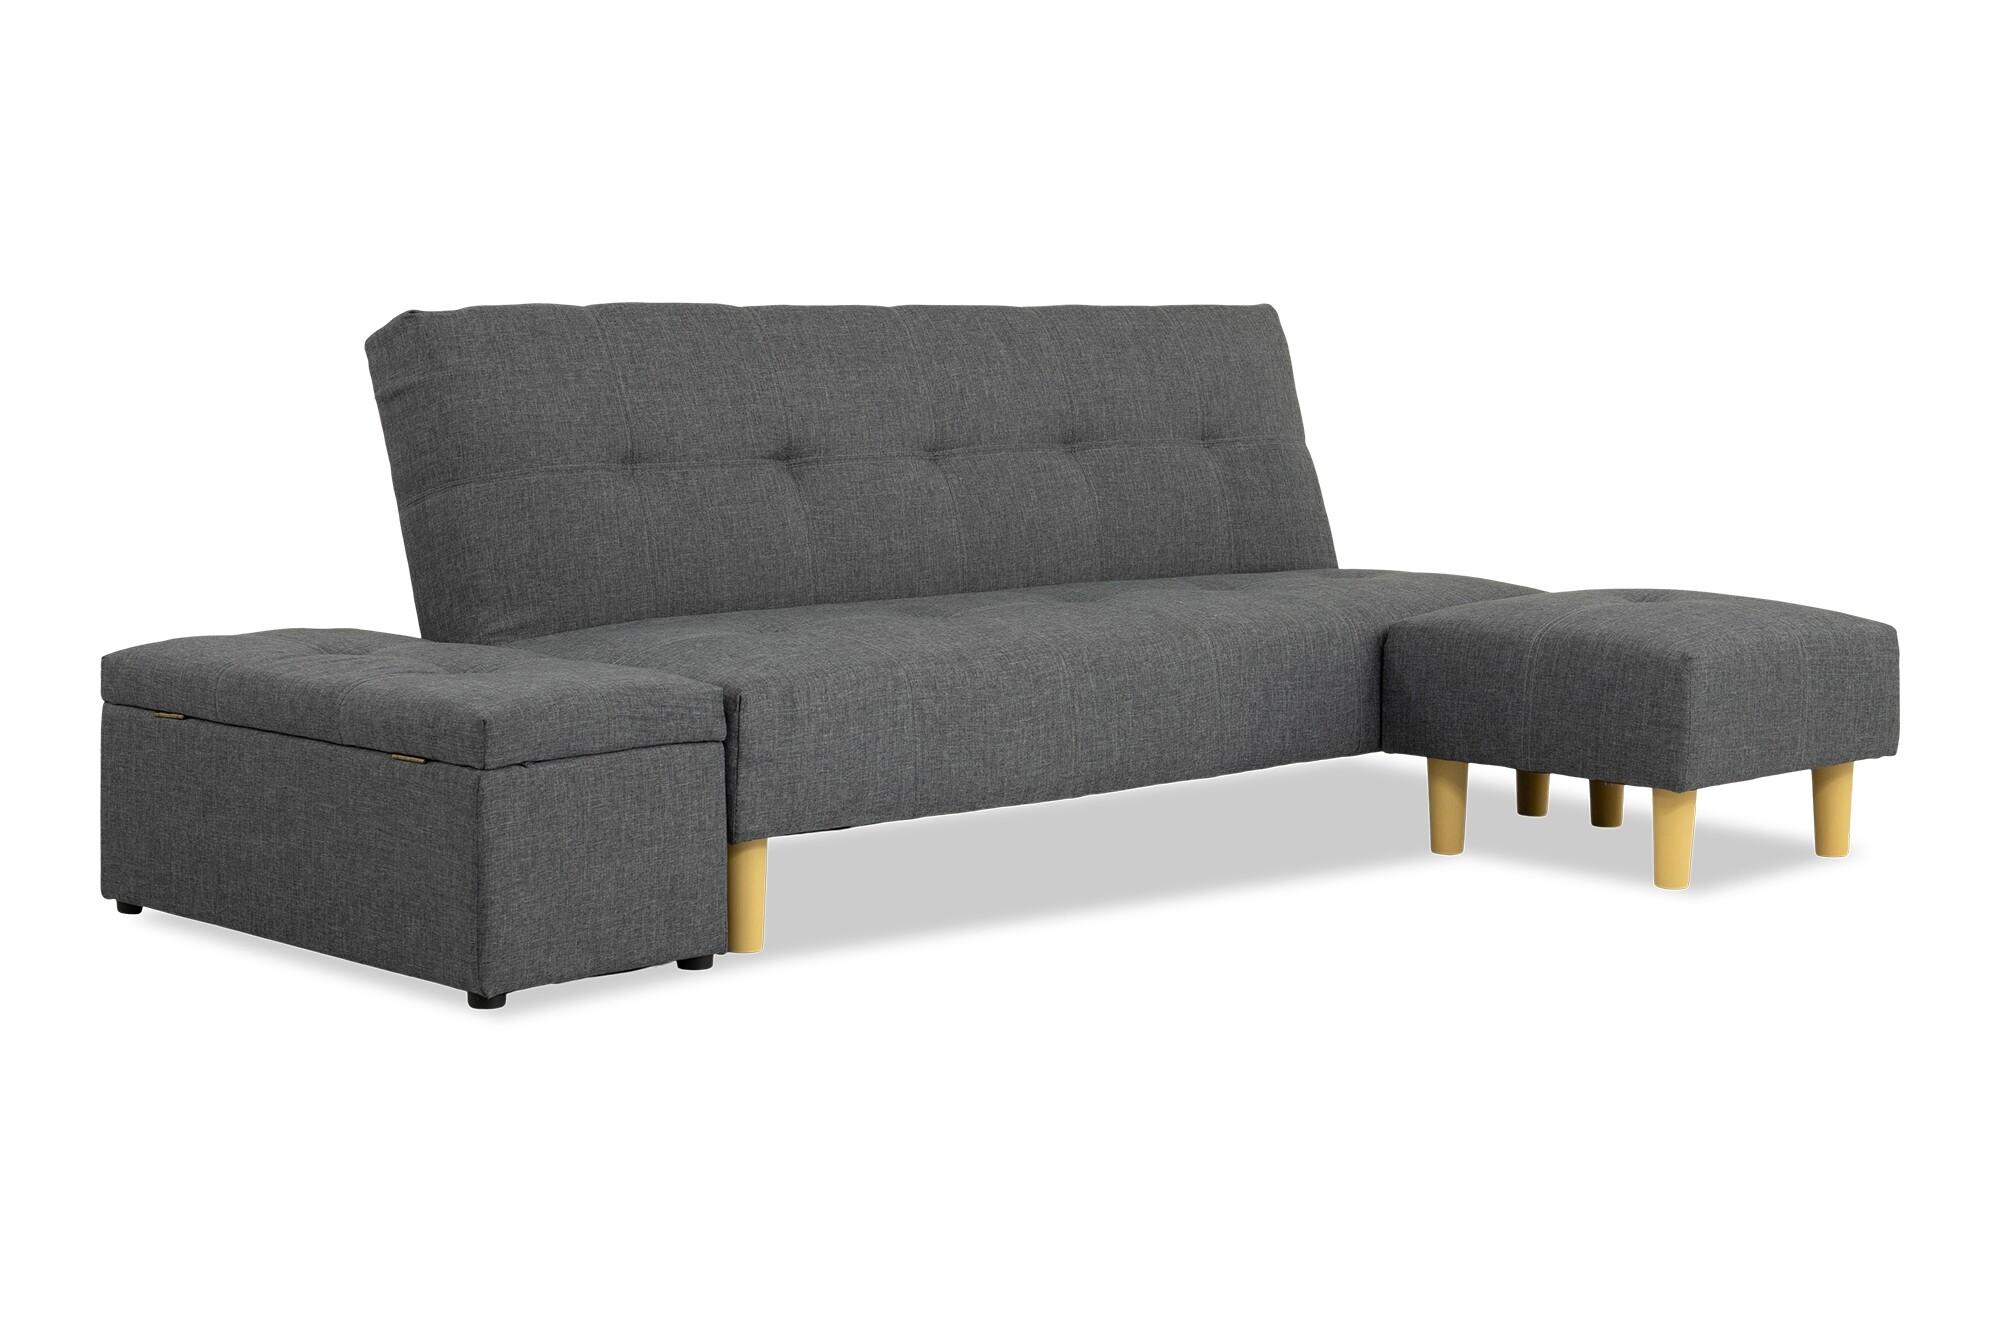 Wongg 4 Seater Sofa Bed Set Fabric